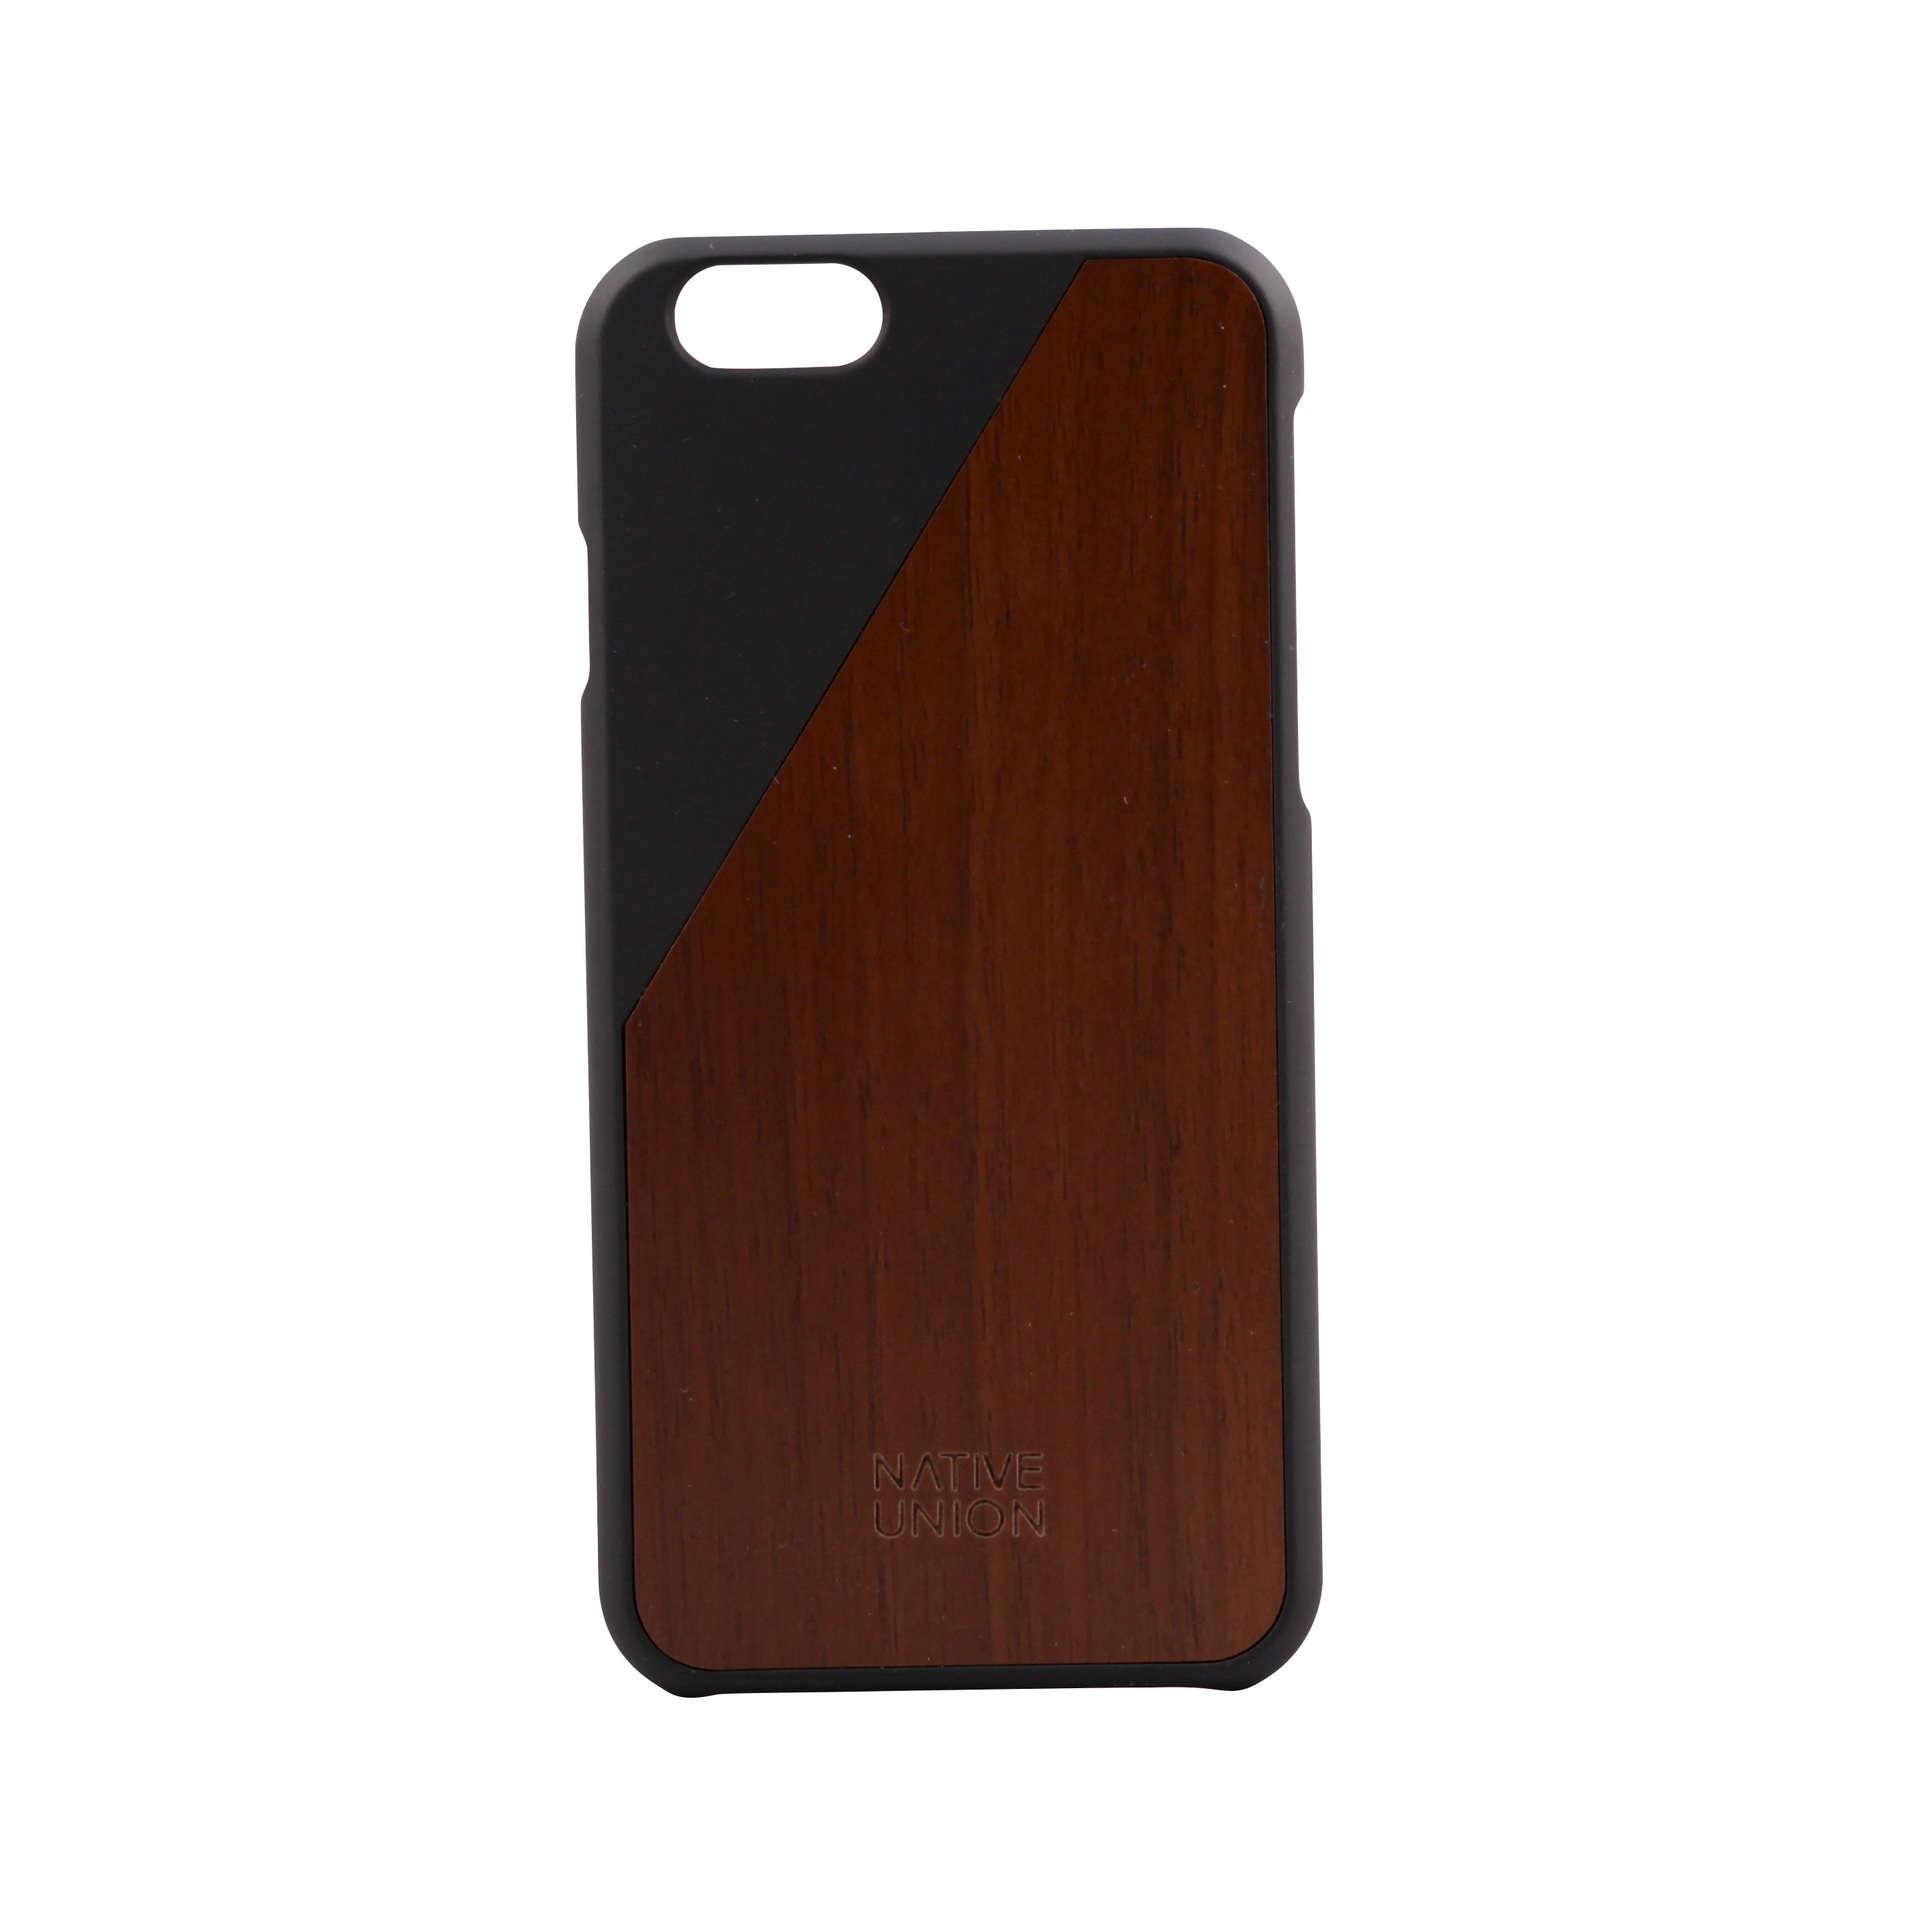 NU Clic iPhone 6 (Black)